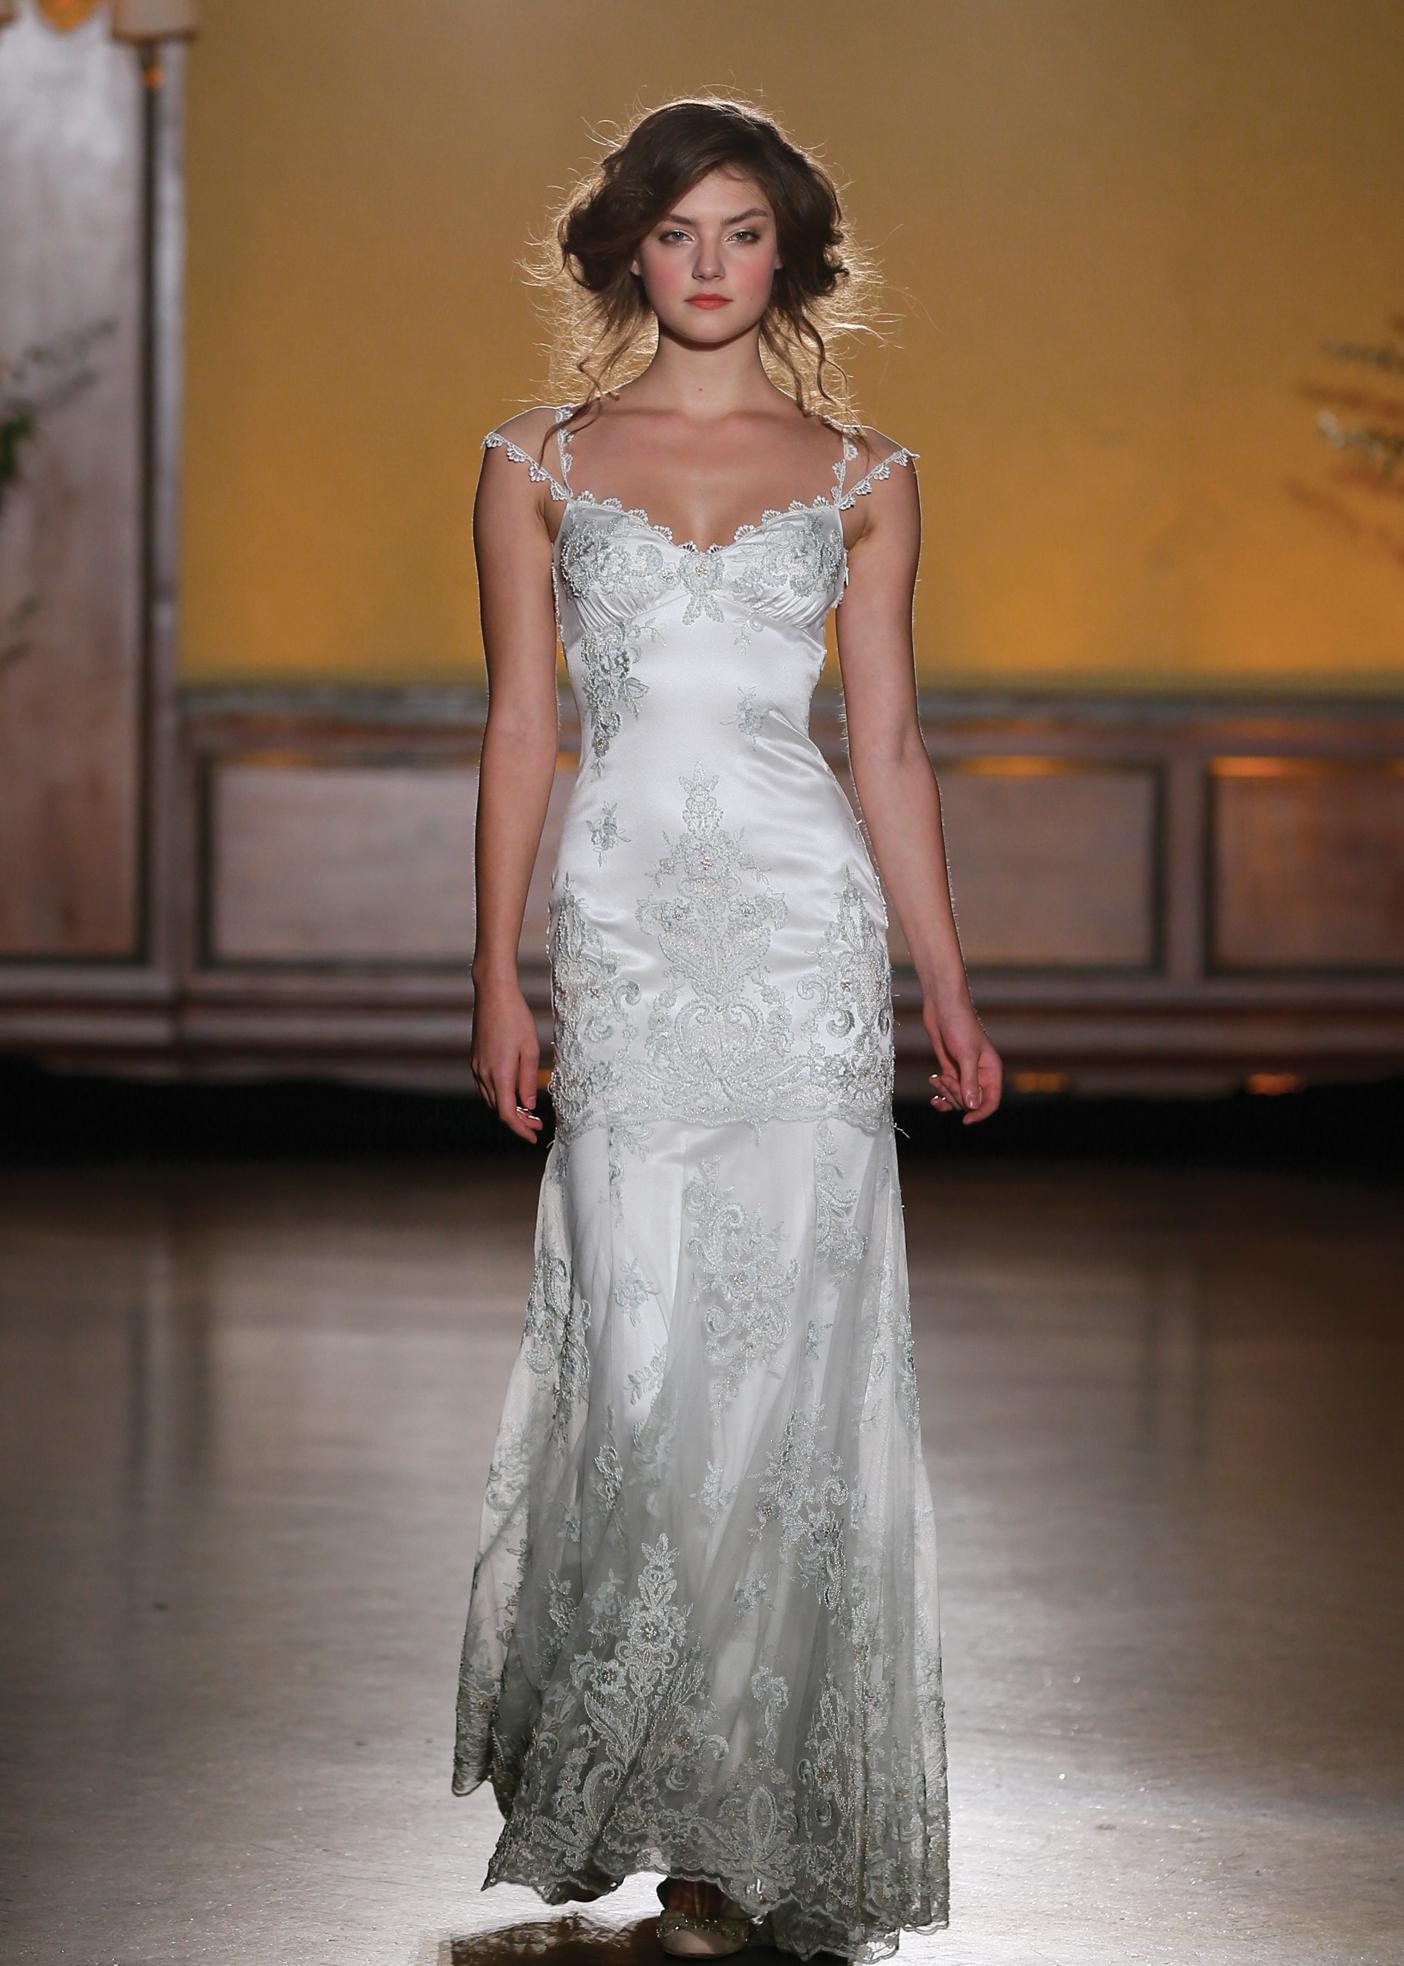 Claire pettibone bridal wedding gowns in ny nj ct and pa claire pettibone cameo junglespirit Images